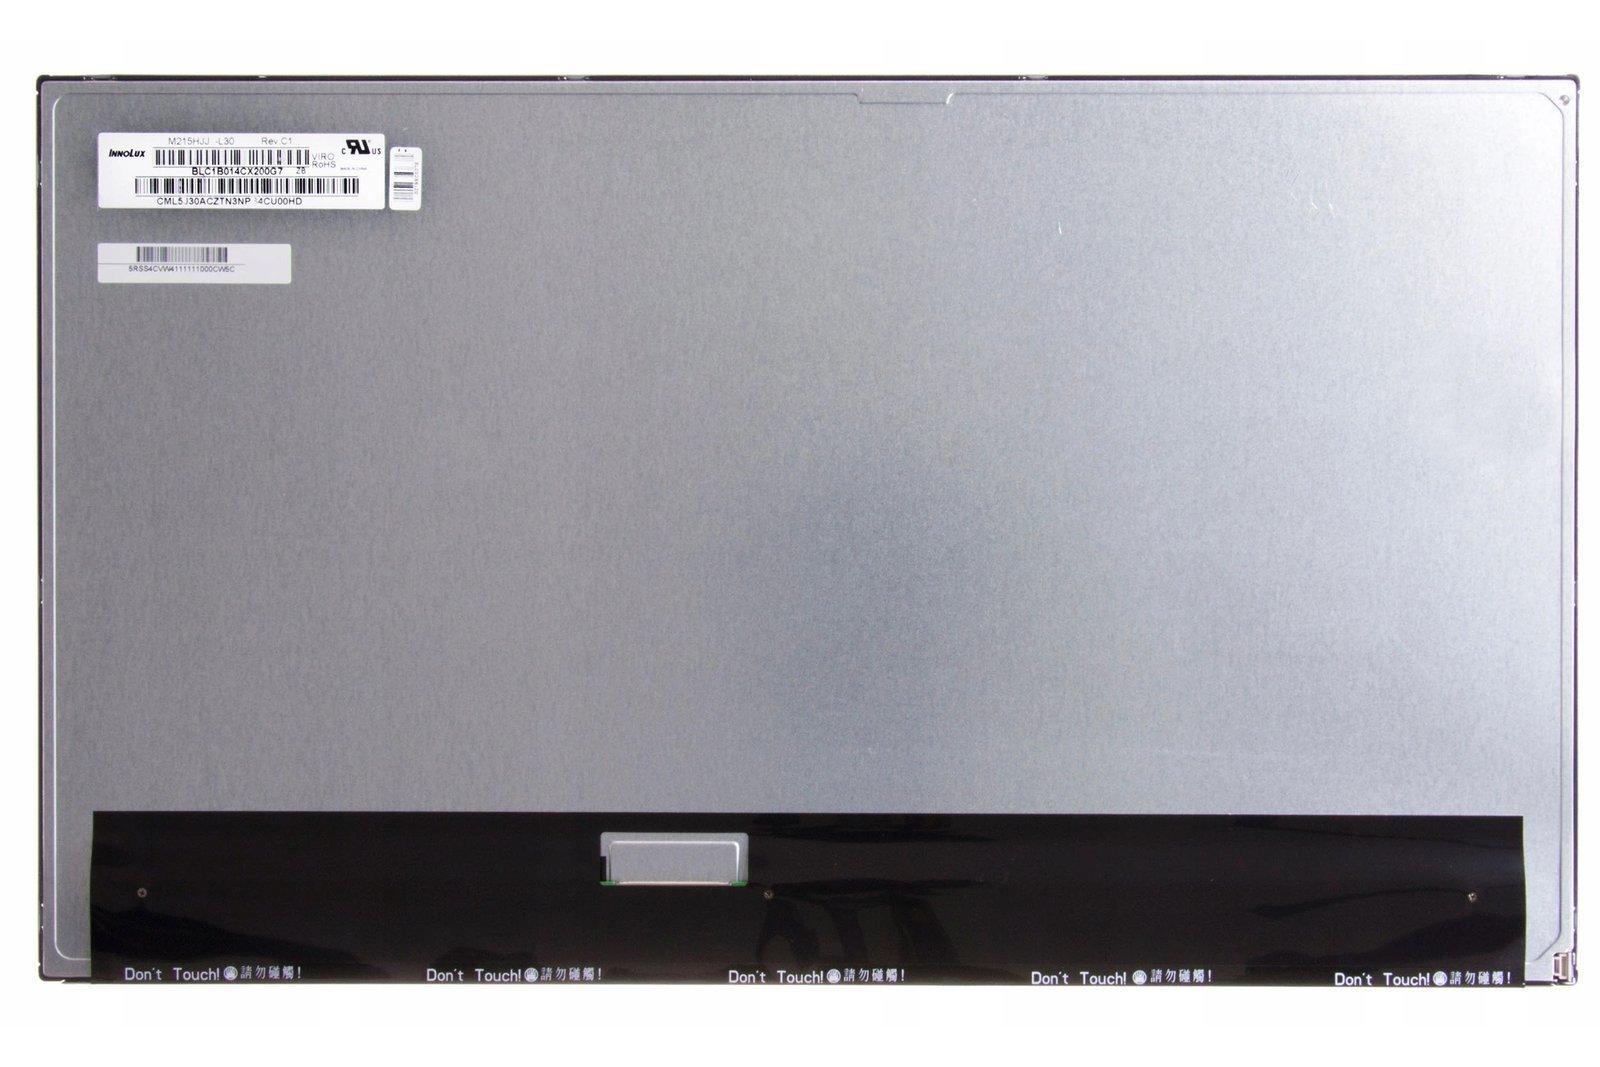 Bildschirm Innolux 21.5' M215HJJ-L30 Rev. C1 FullHD